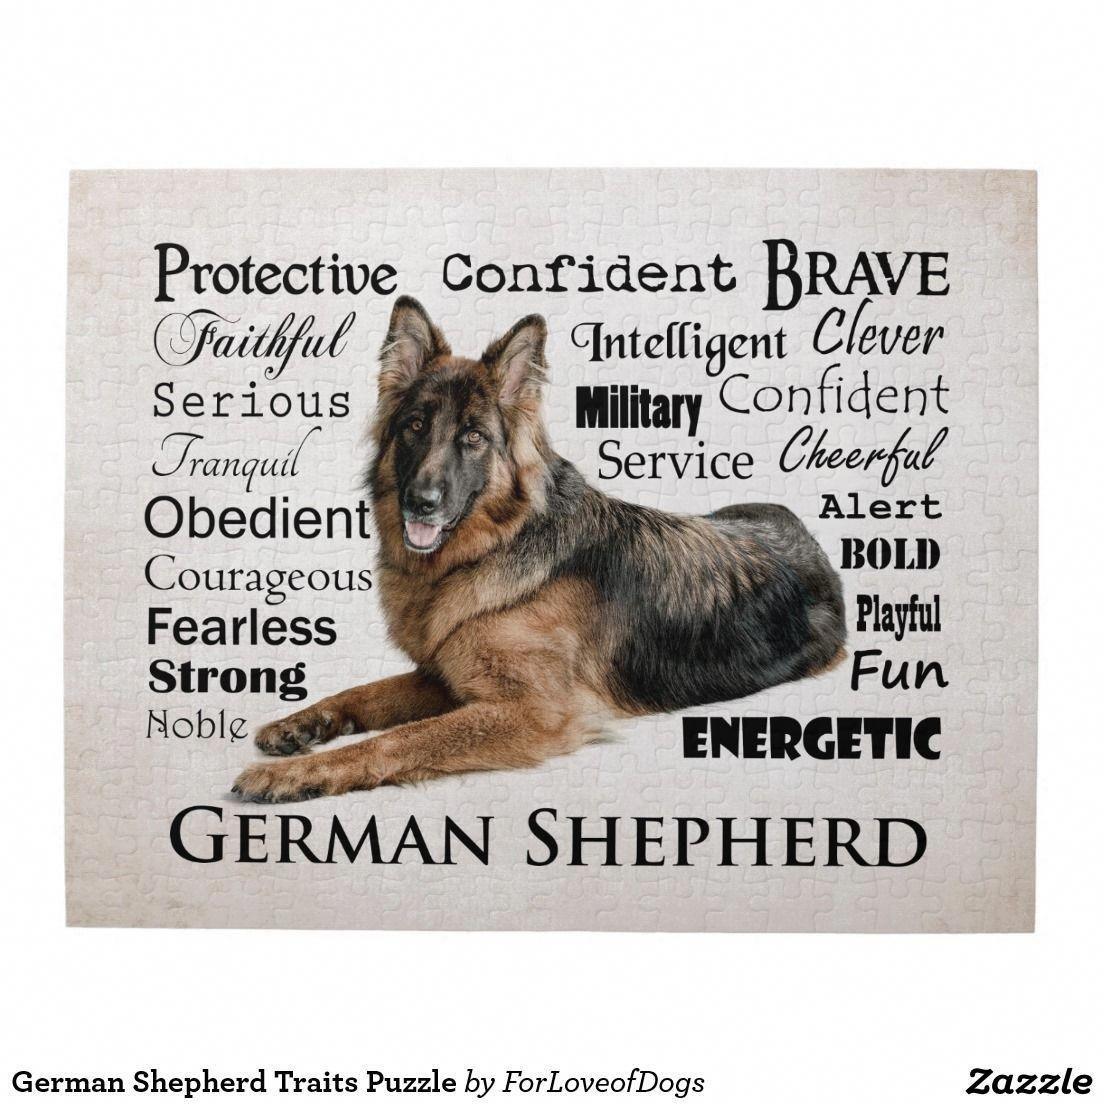 German Shepherd Traits Puzzle Zazzle Com German Shepherd